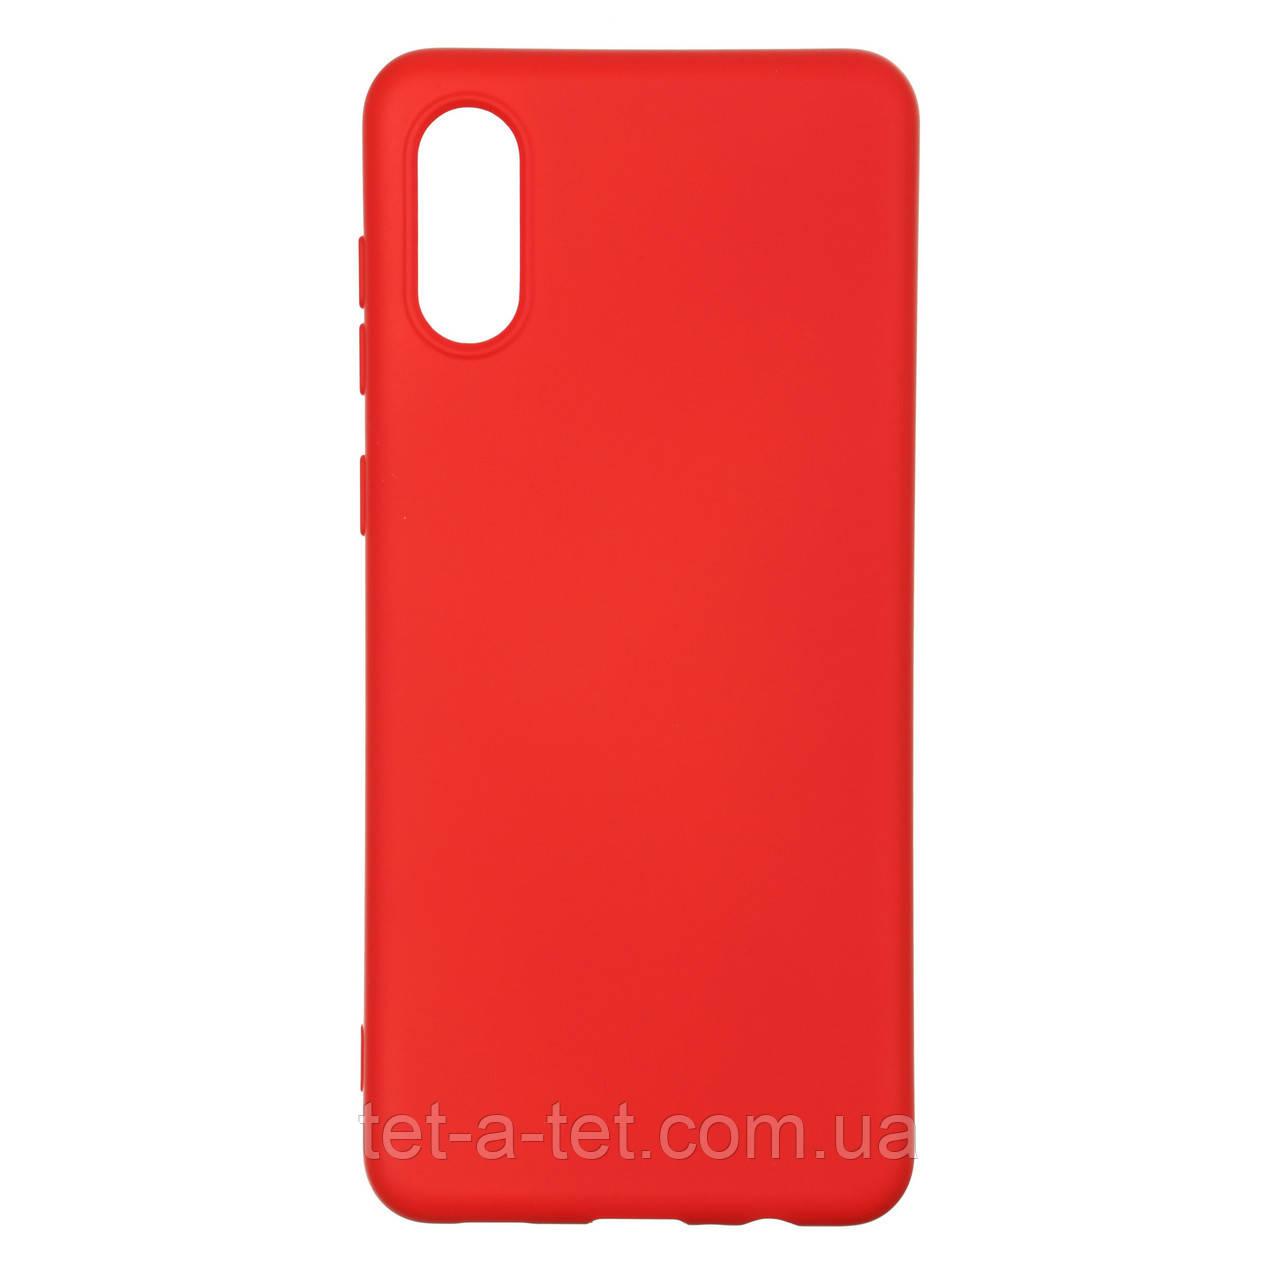 Чохол силіконовий ArmorStandart ICON Case for Samsung A02 (A022) Red Chili